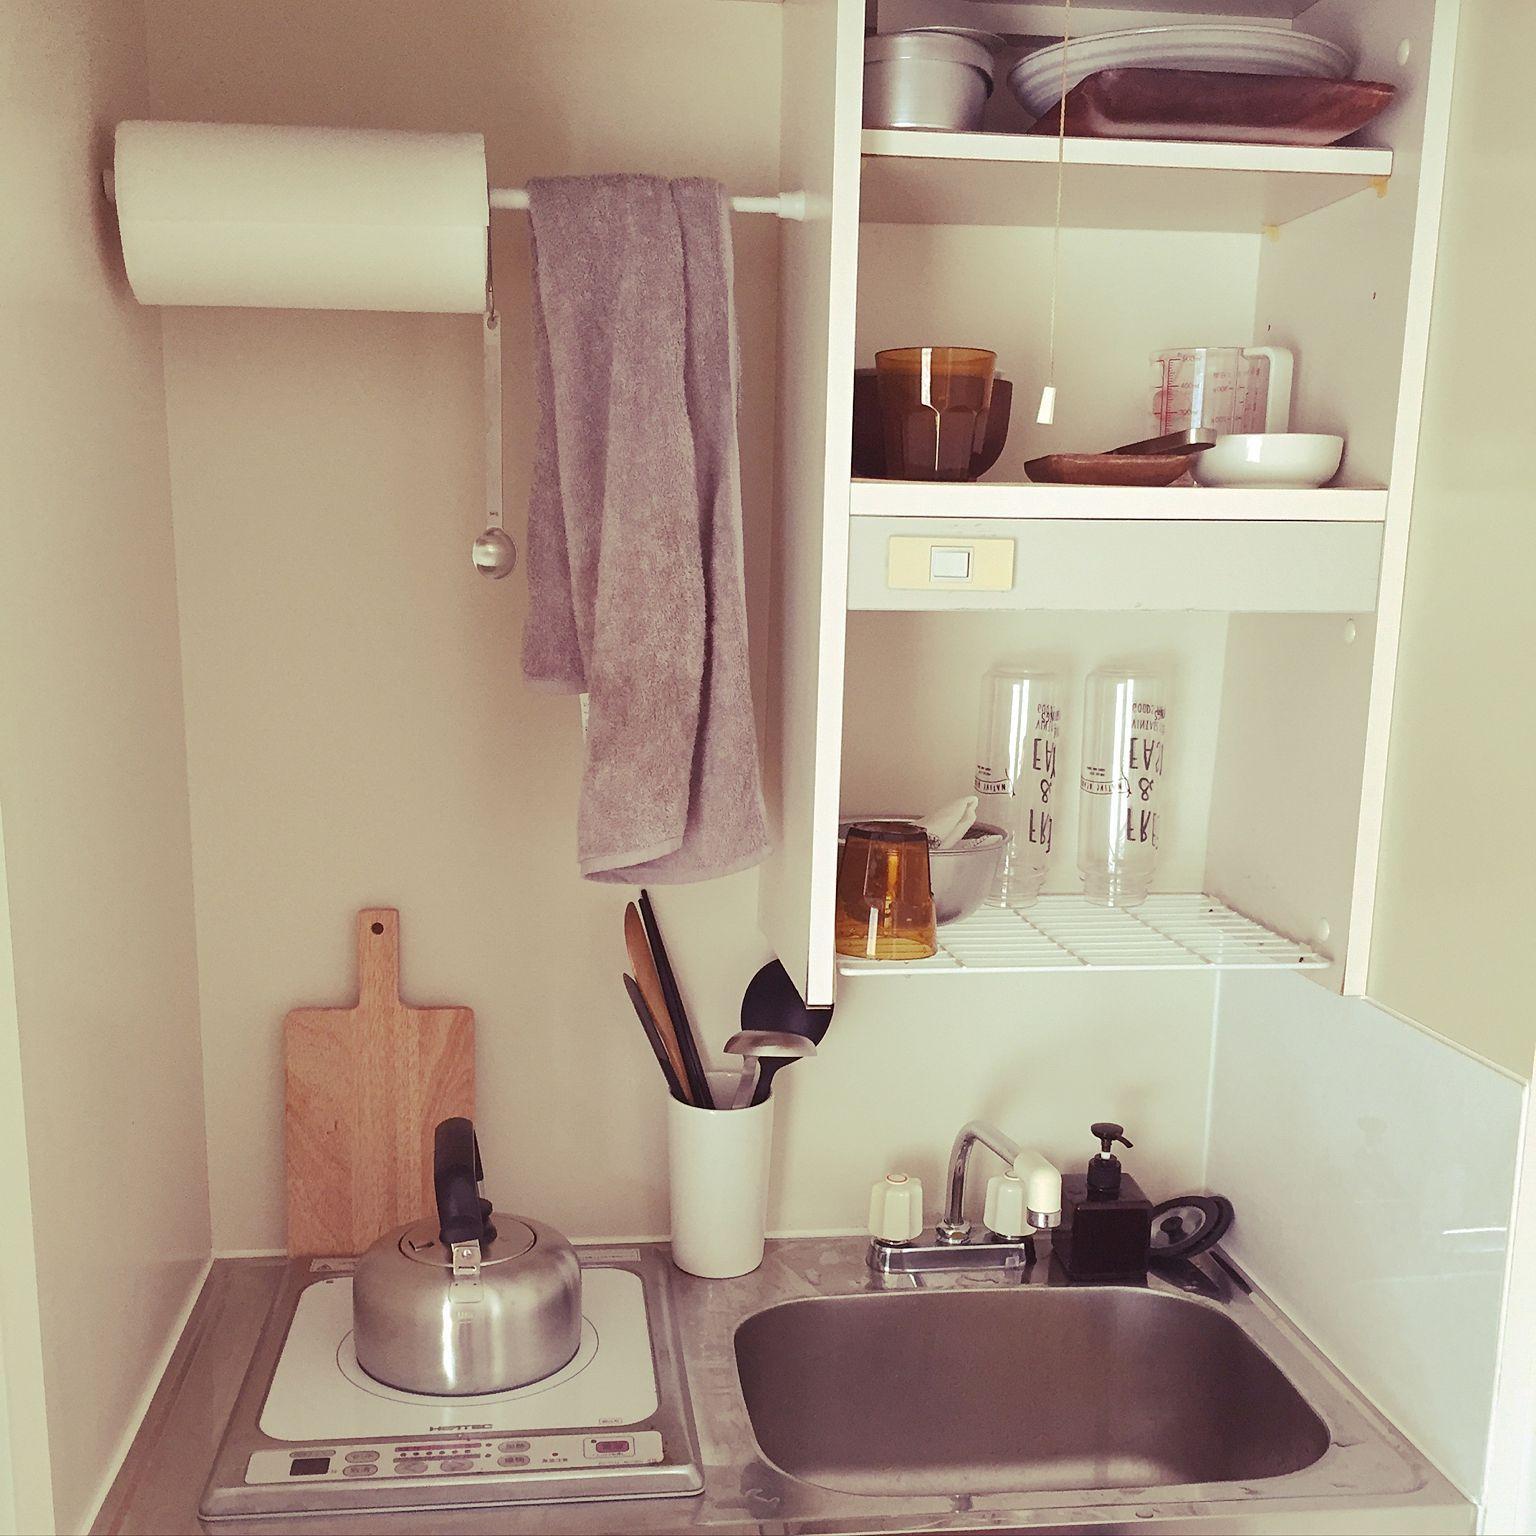 Galley Kitchen Ideas 2016: キッチン/100均/一人暮らし/無印良品/ワンルームのインテリア実例